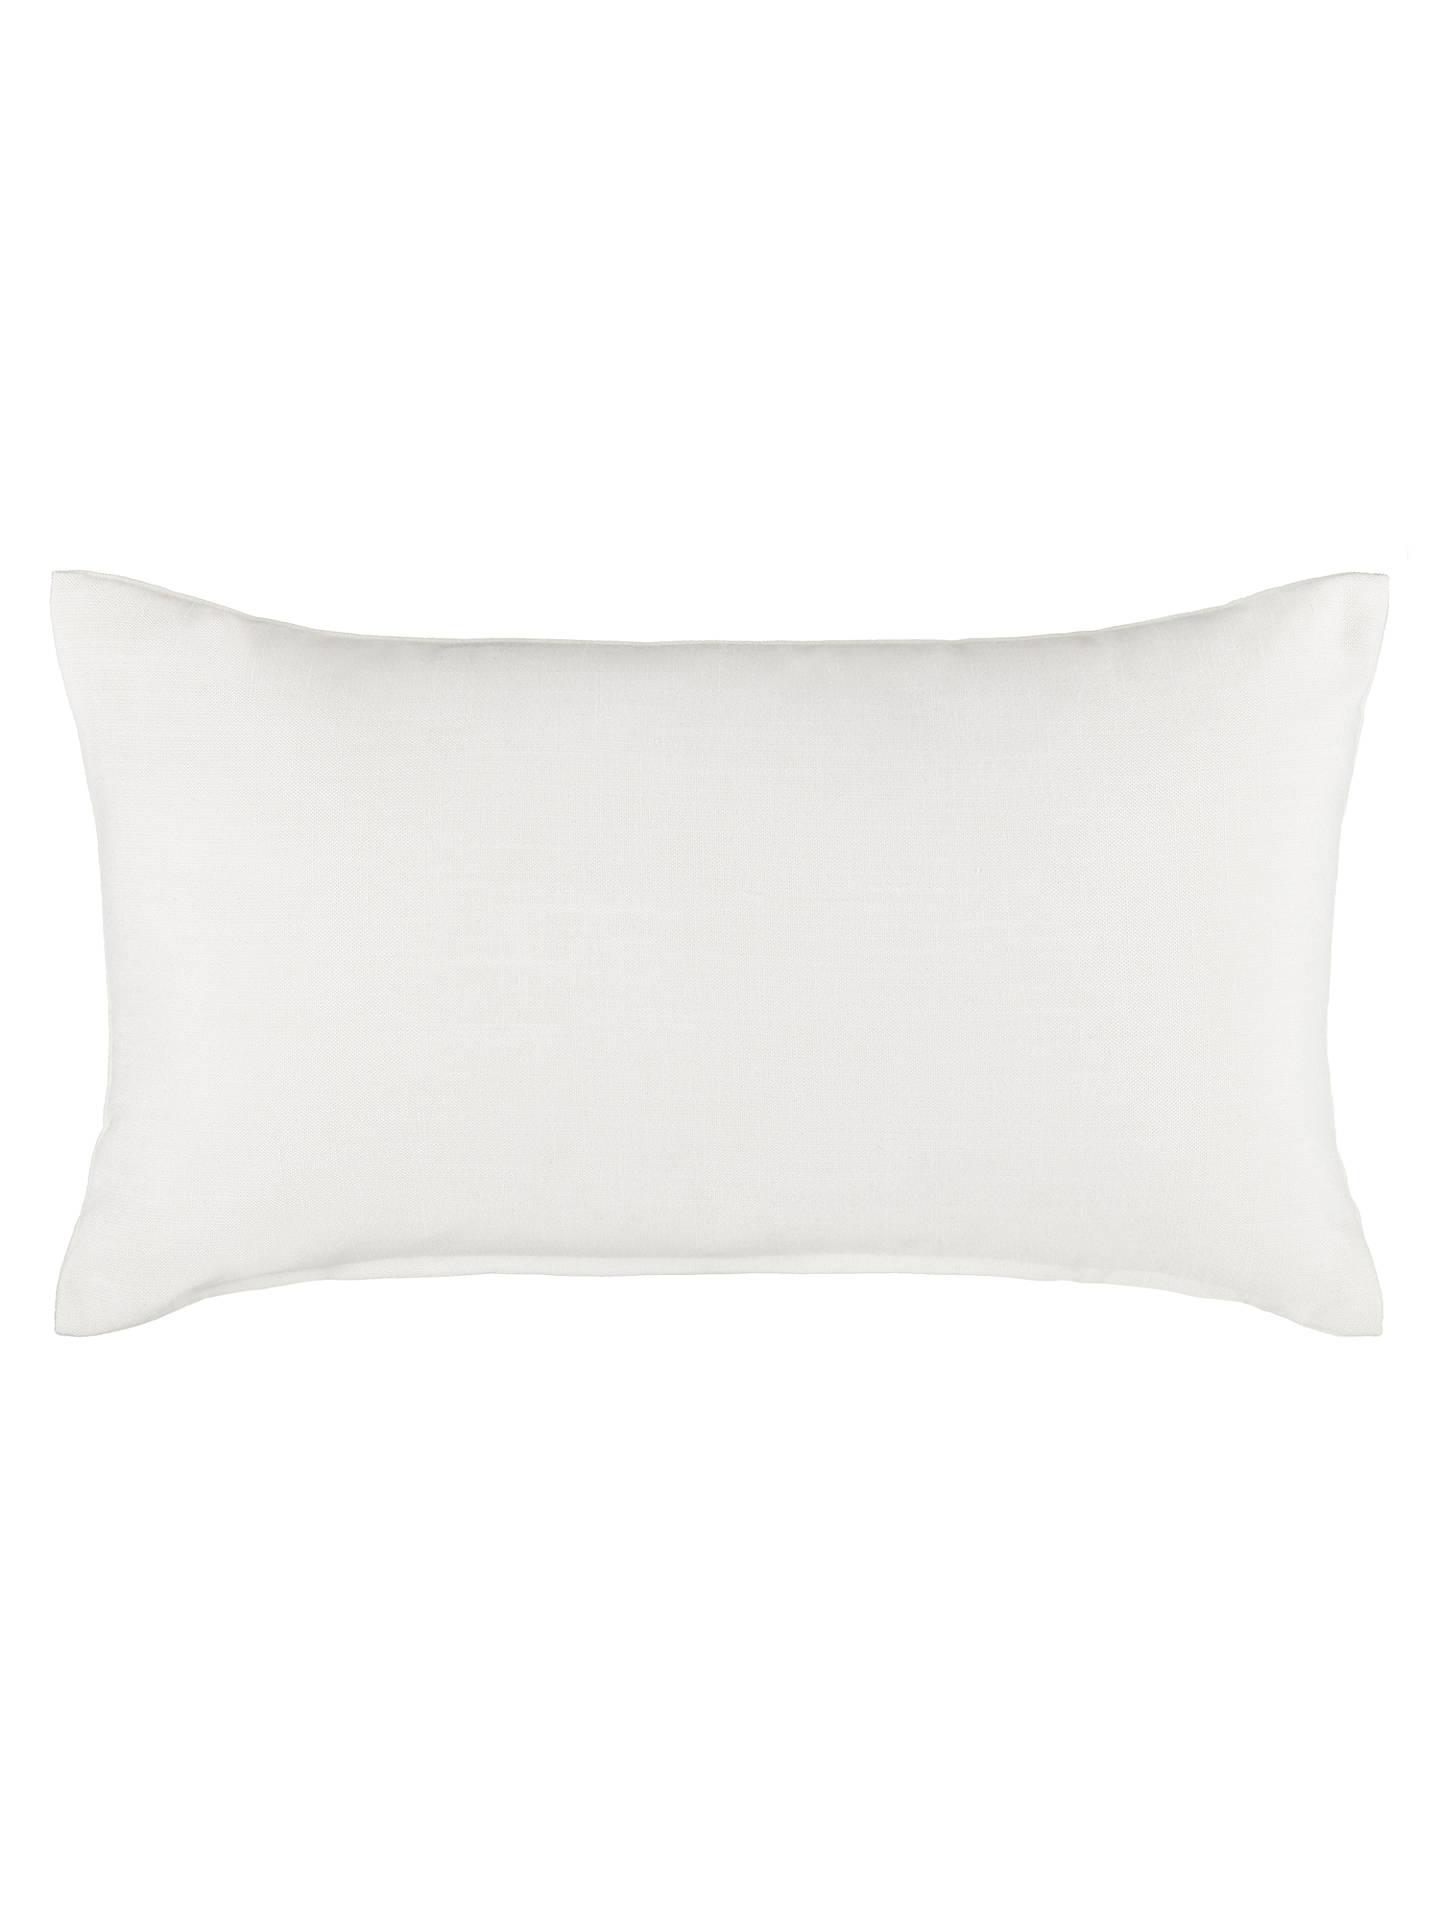 john lewis sleep cushion at john lewis partners. Black Bedroom Furniture Sets. Home Design Ideas